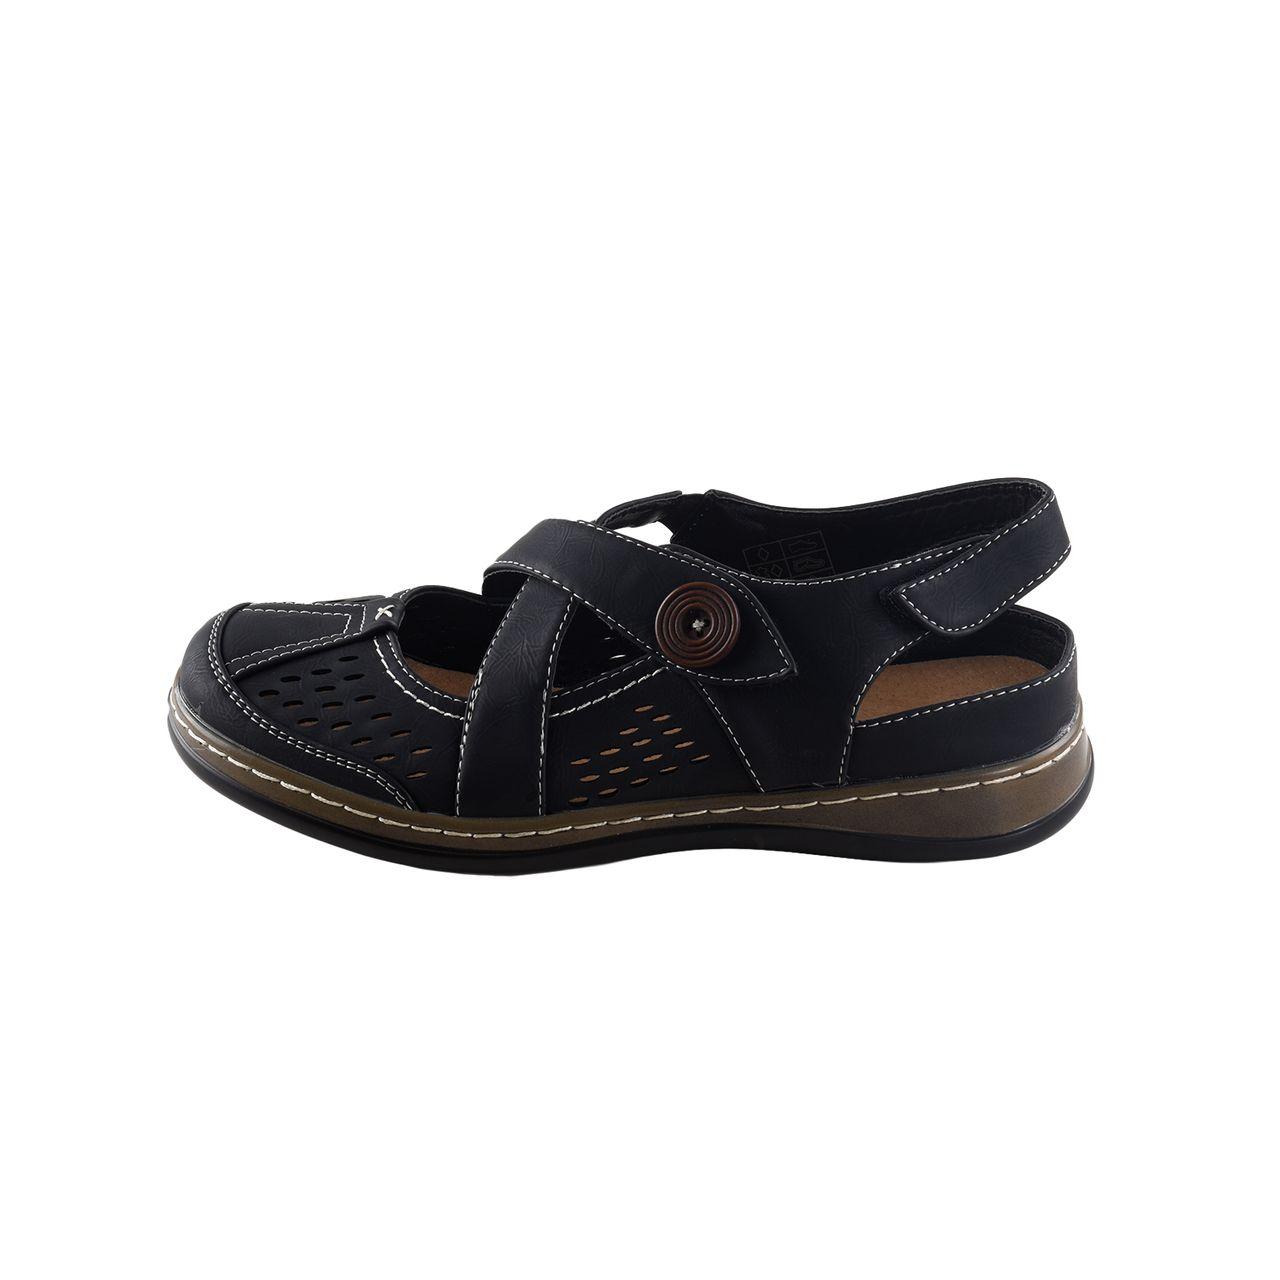 lisanne comfort damen sandalen wei e ziern hte schwarz ebay. Black Bedroom Furniture Sets. Home Design Ideas